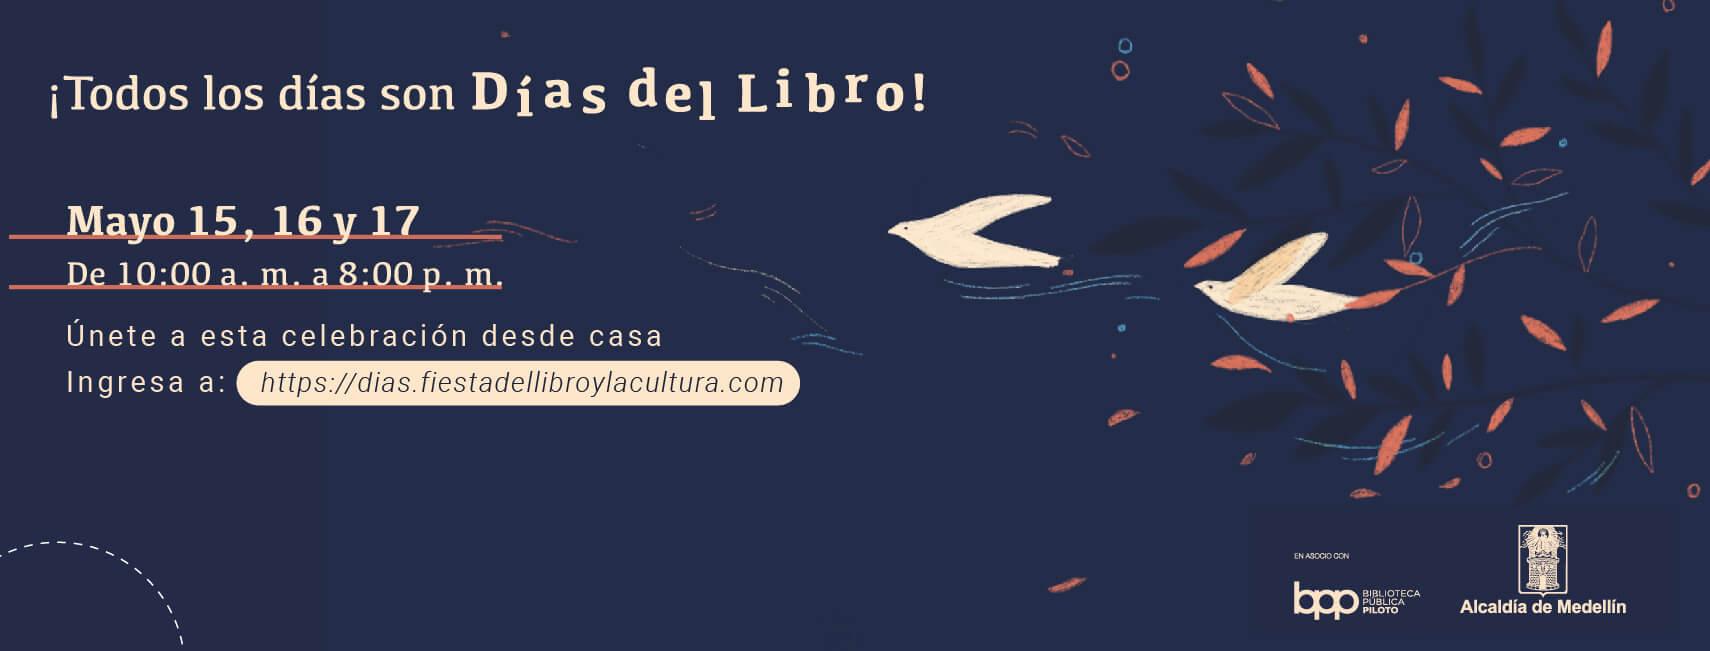 http://dias.fiestadellibroylacultura.com